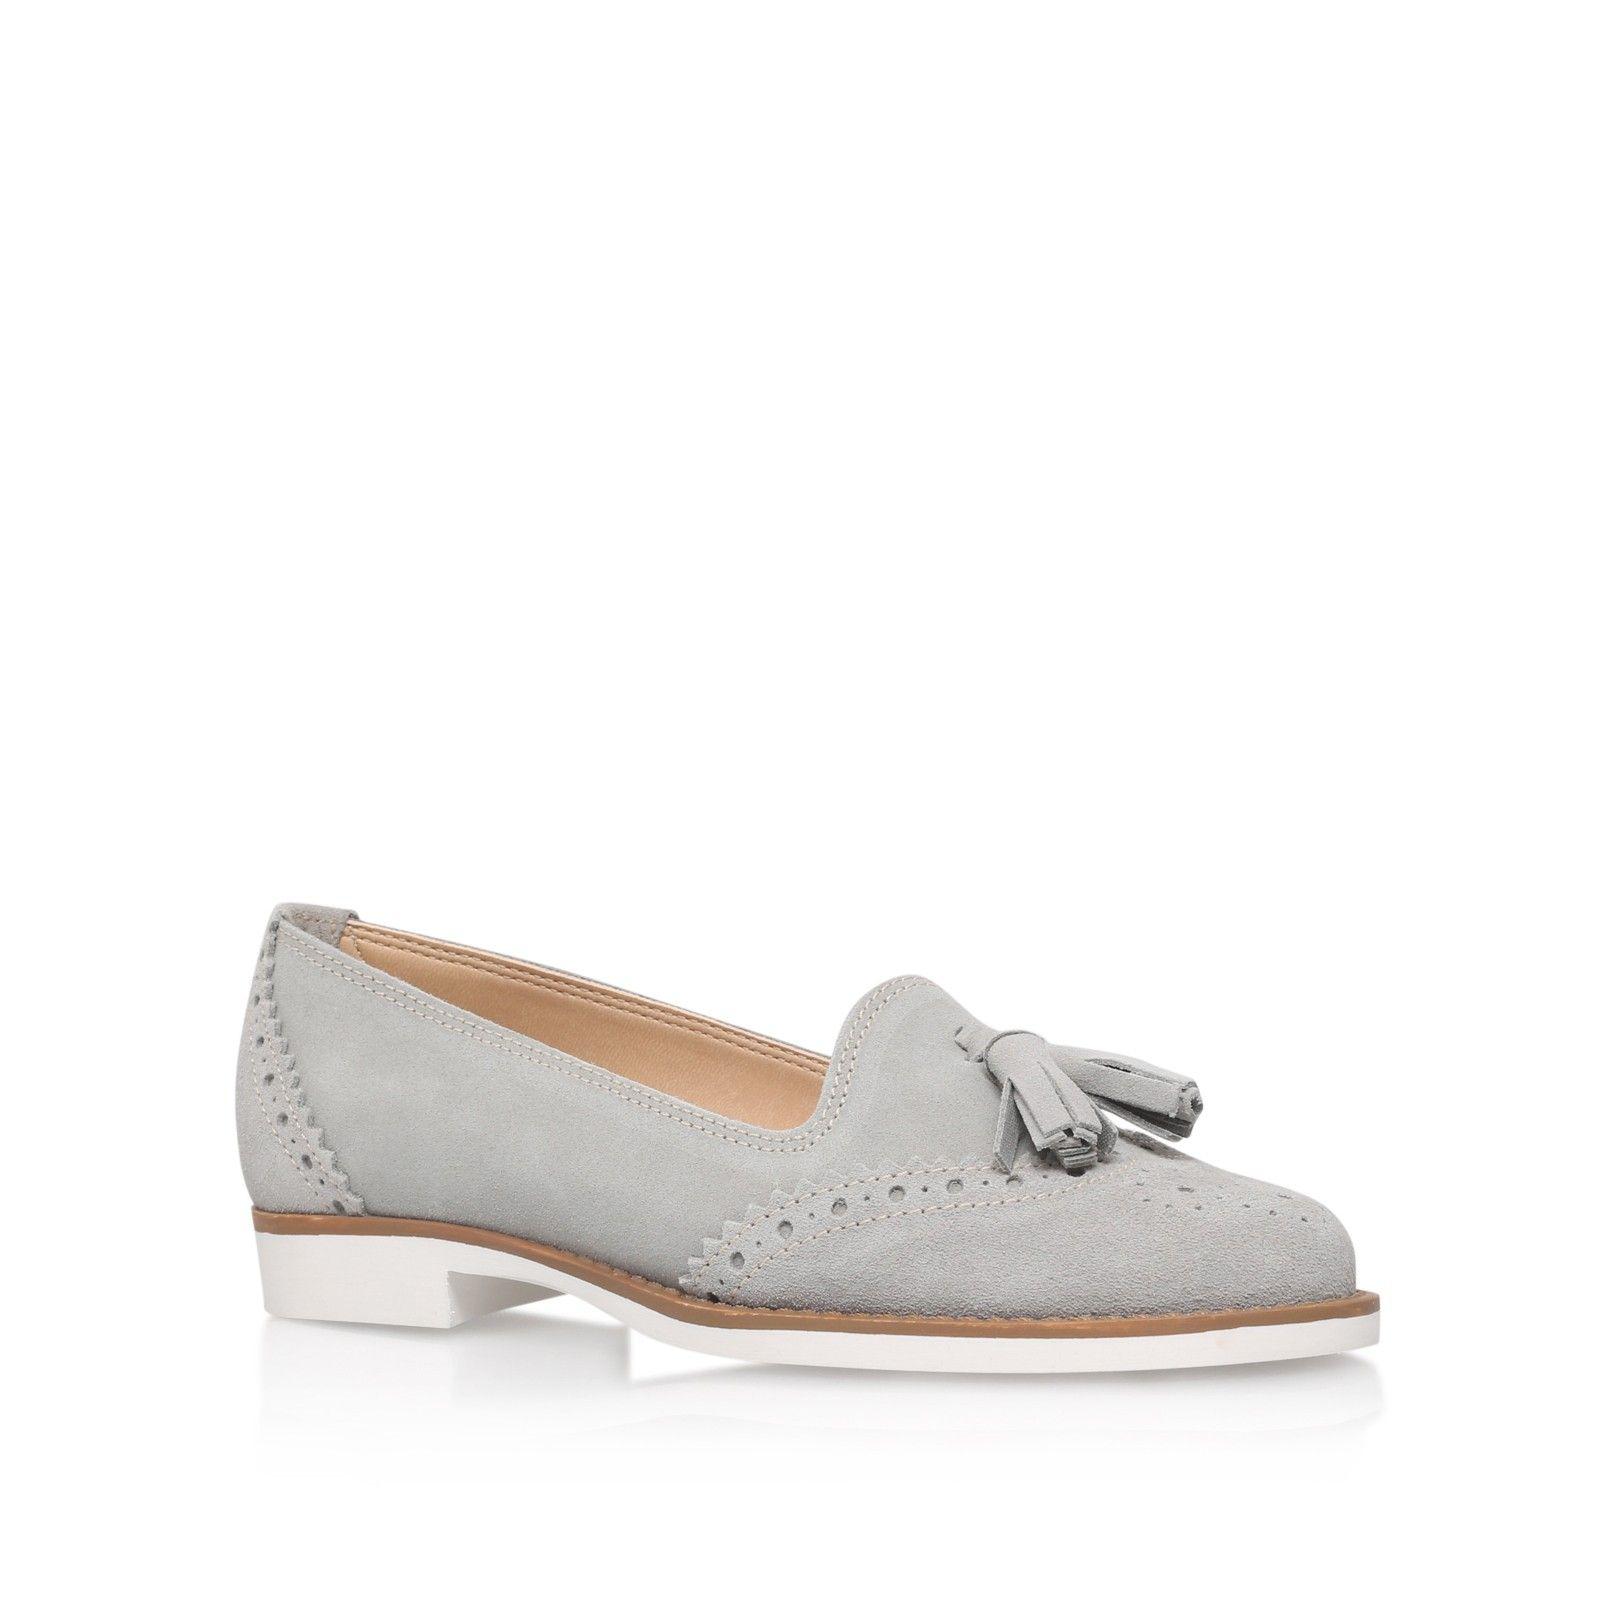 carvela kurt geiger nude loafers uk 6.5 | eBay